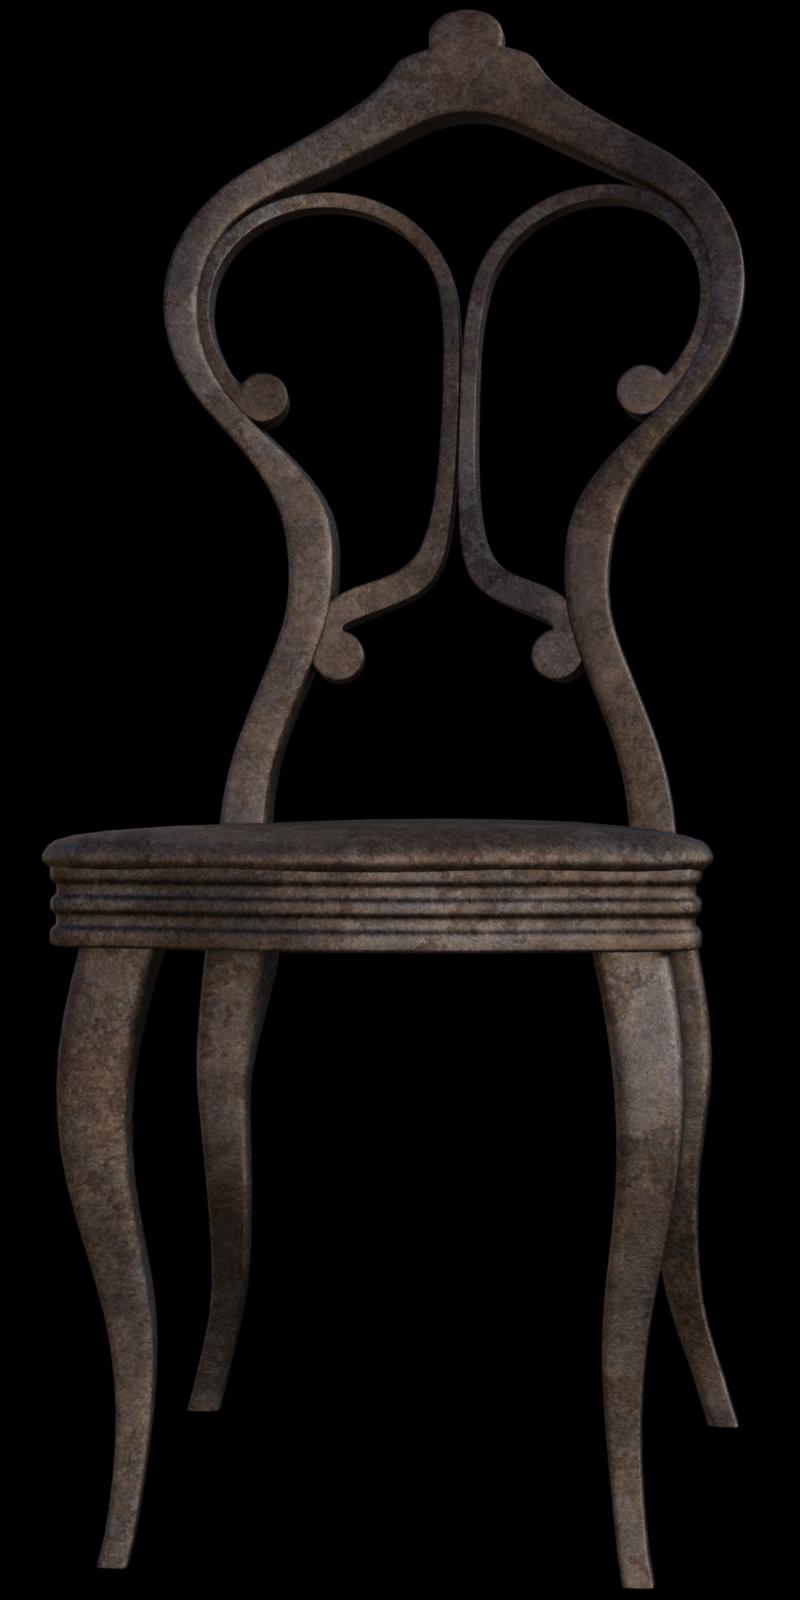 Tube de chaise Steampunk (render-image)